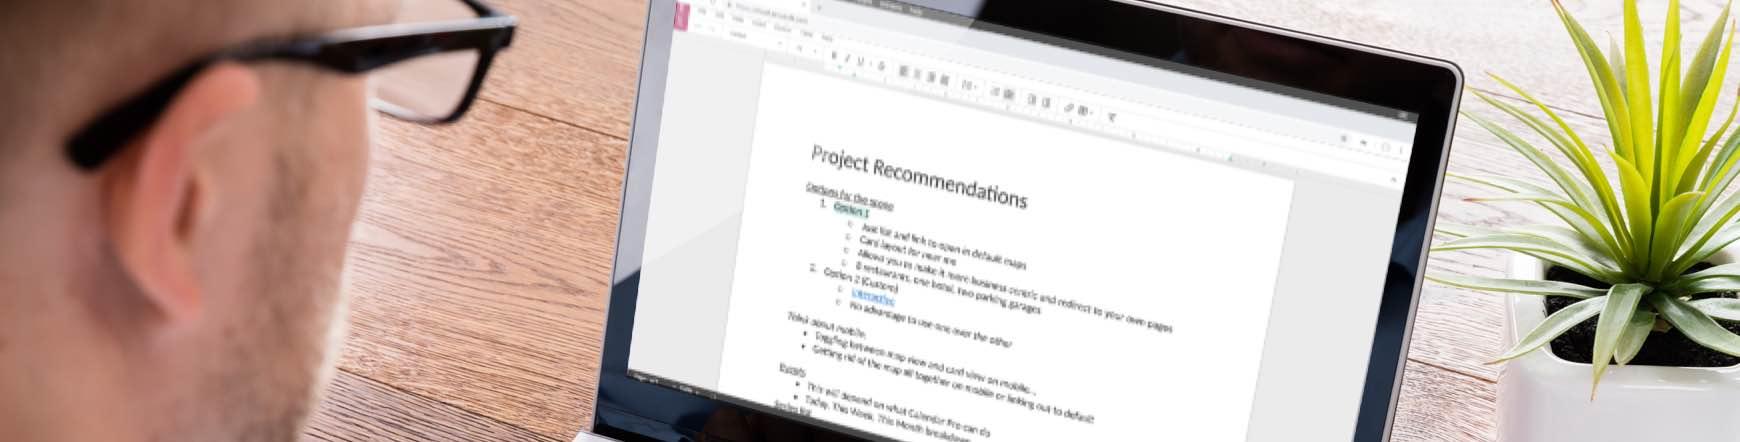 PrizmDoc Editor in use